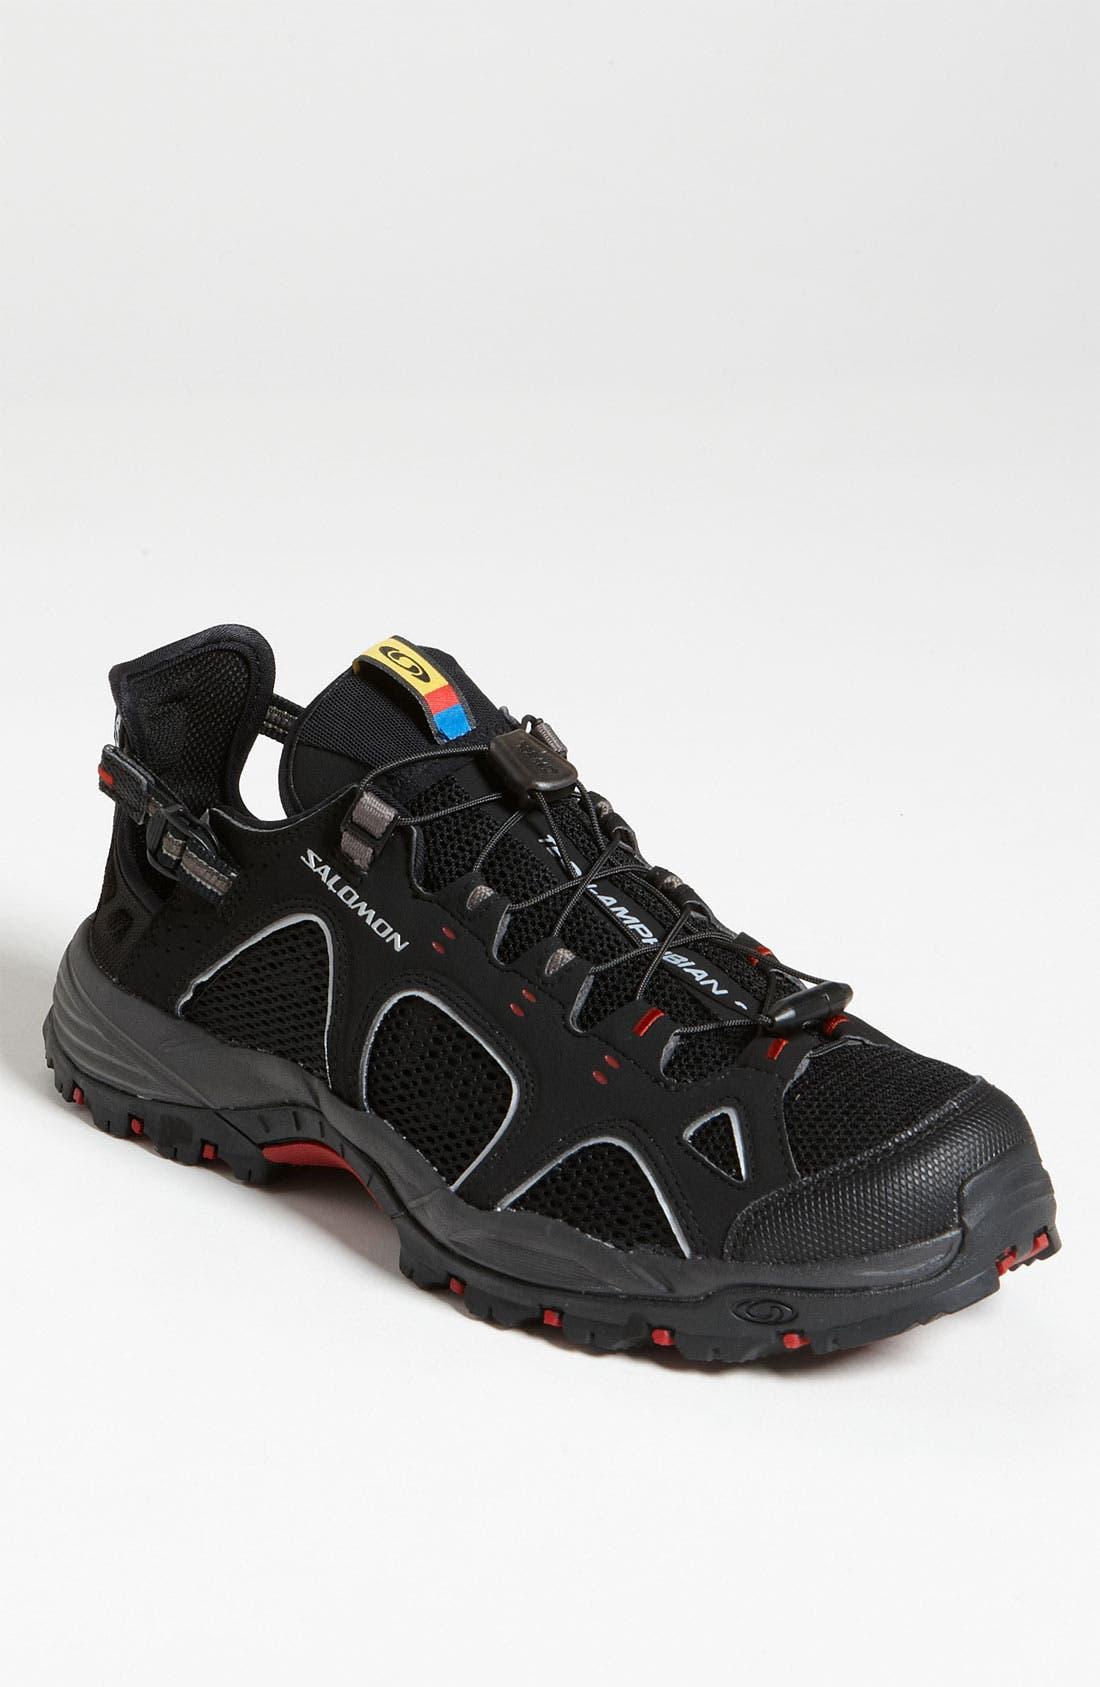 Alternate Image 1 Selected - Salomon 'Techamphibian 3' Hiking Shoe (Men)